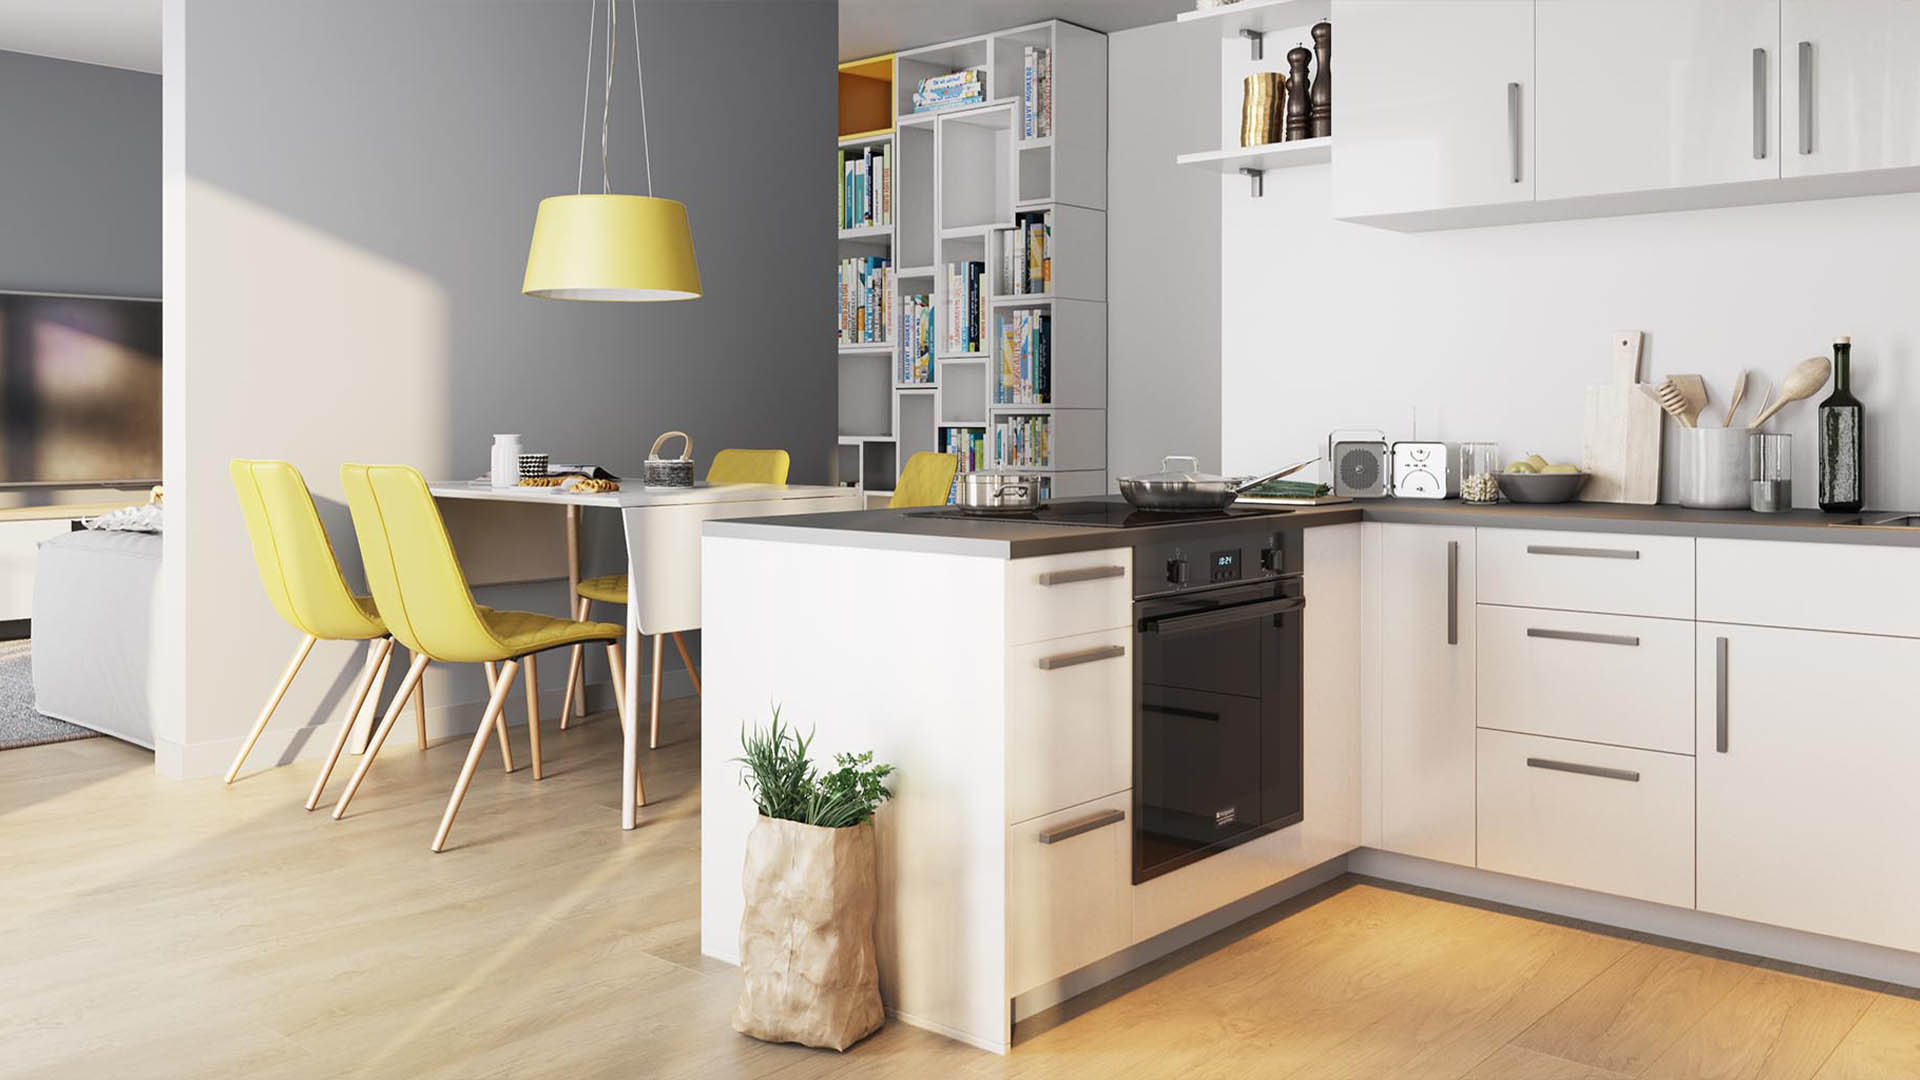 Immobilienmarketing EberhardsHoefe Visualisierung